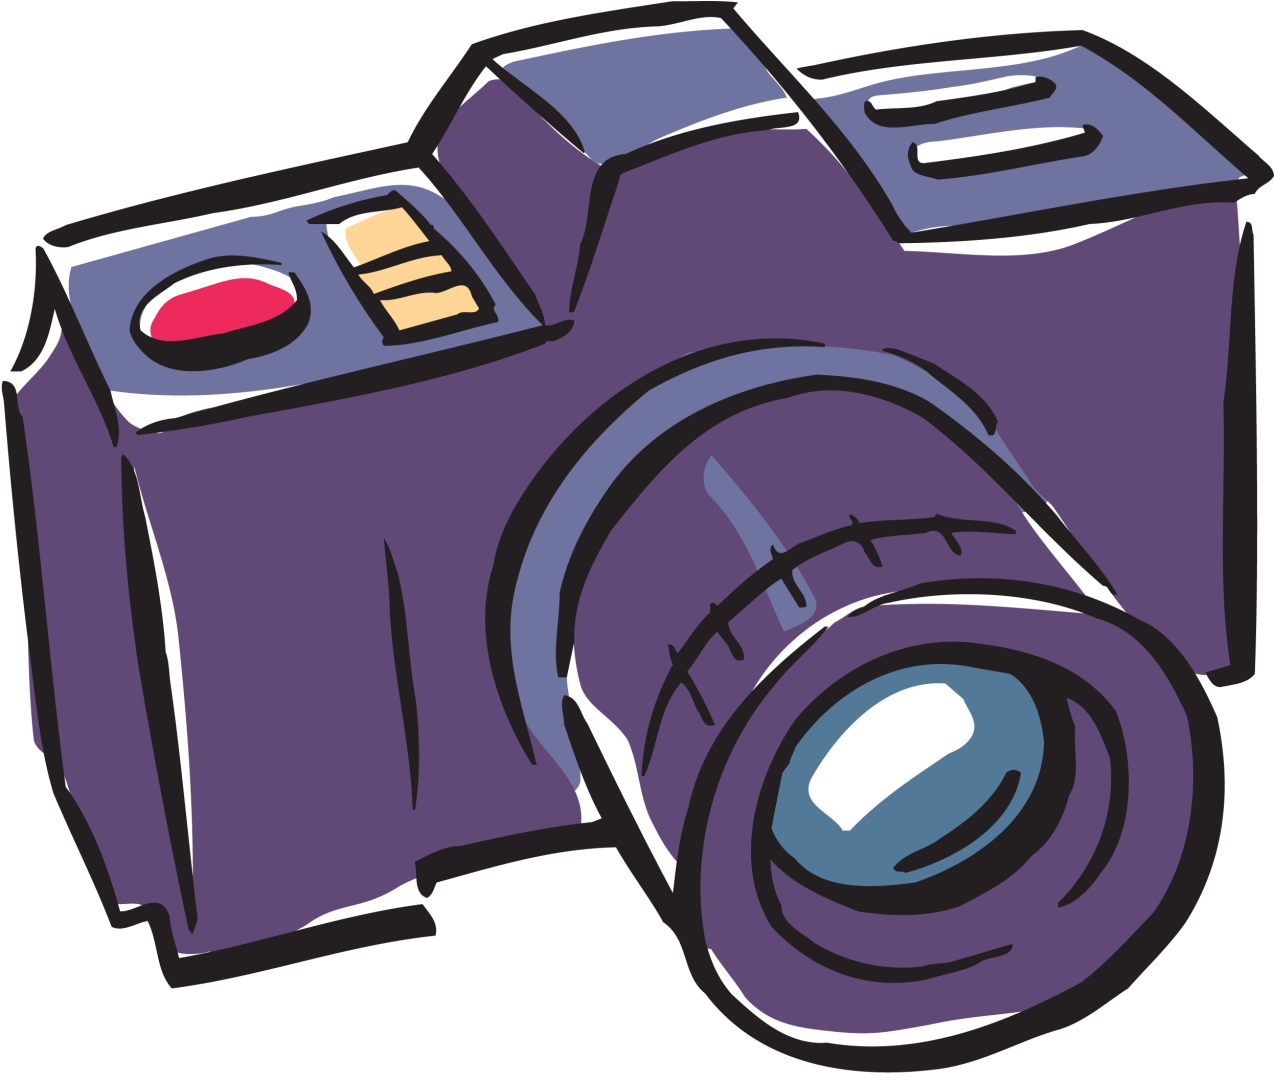 Index of wp content. Clipart camera tourist